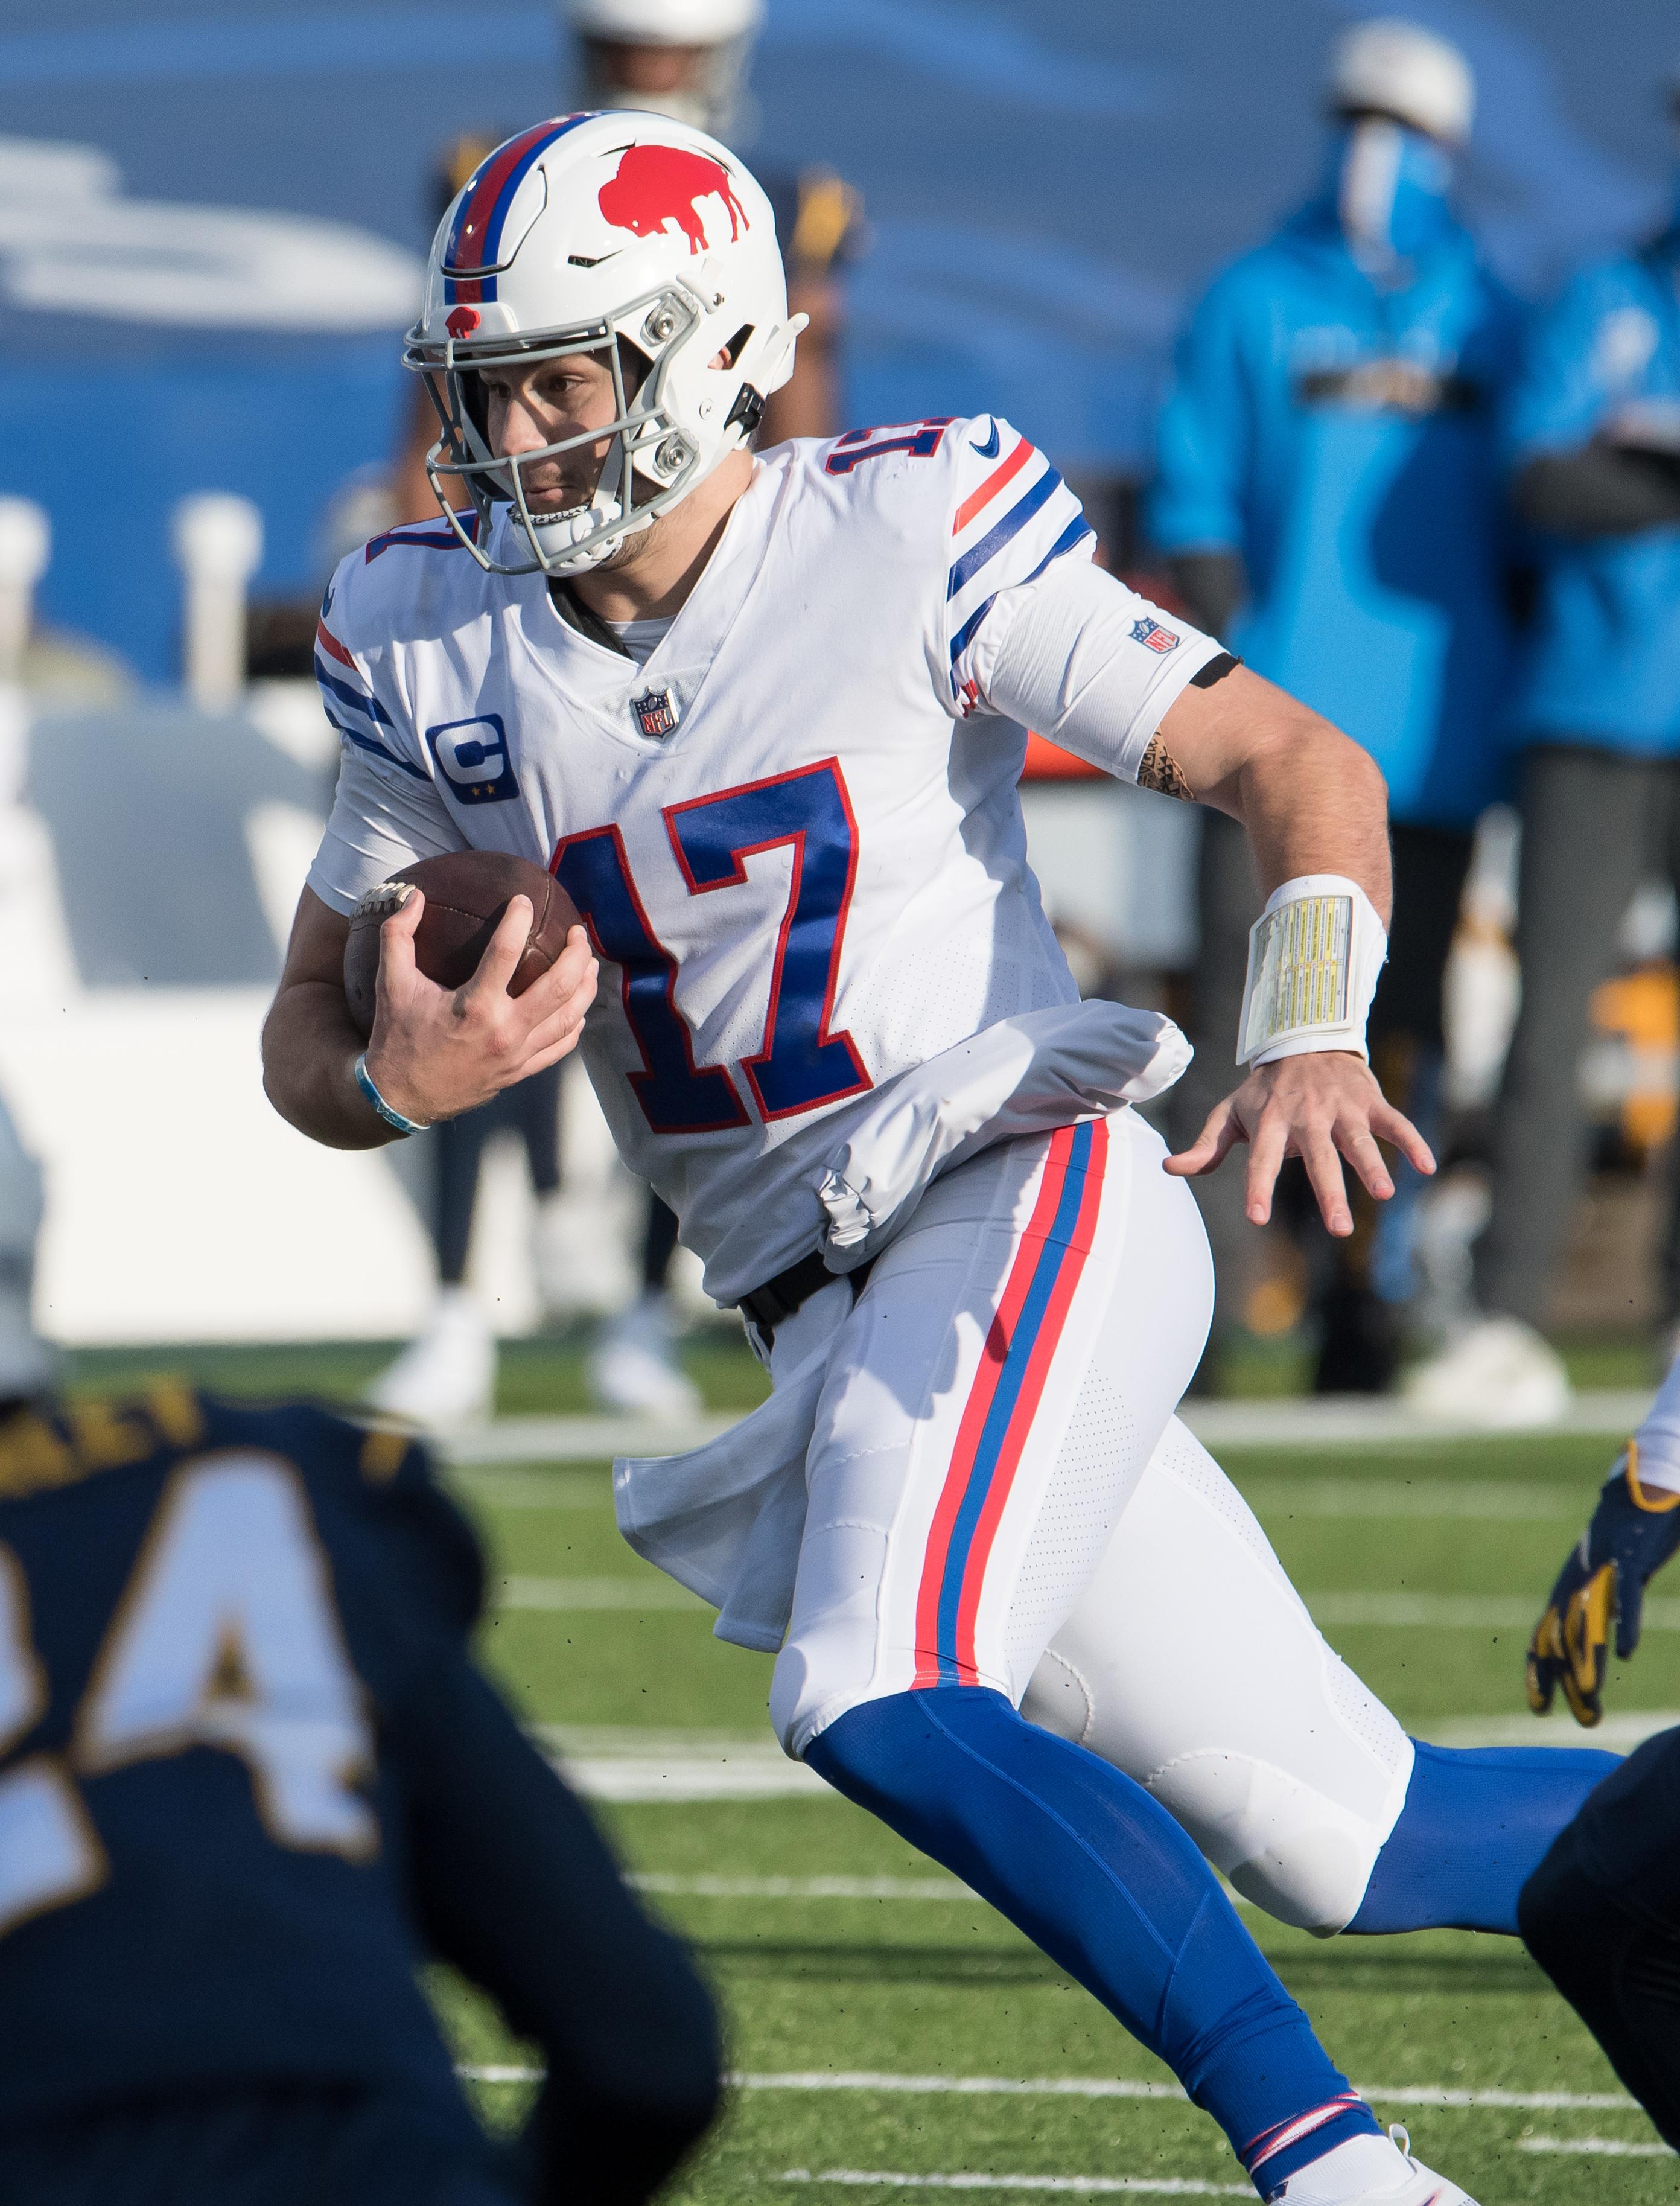 Buffalo Bills quarterback Josh Allen (17) runs for a first down in the second quarter at Bills Stadium.